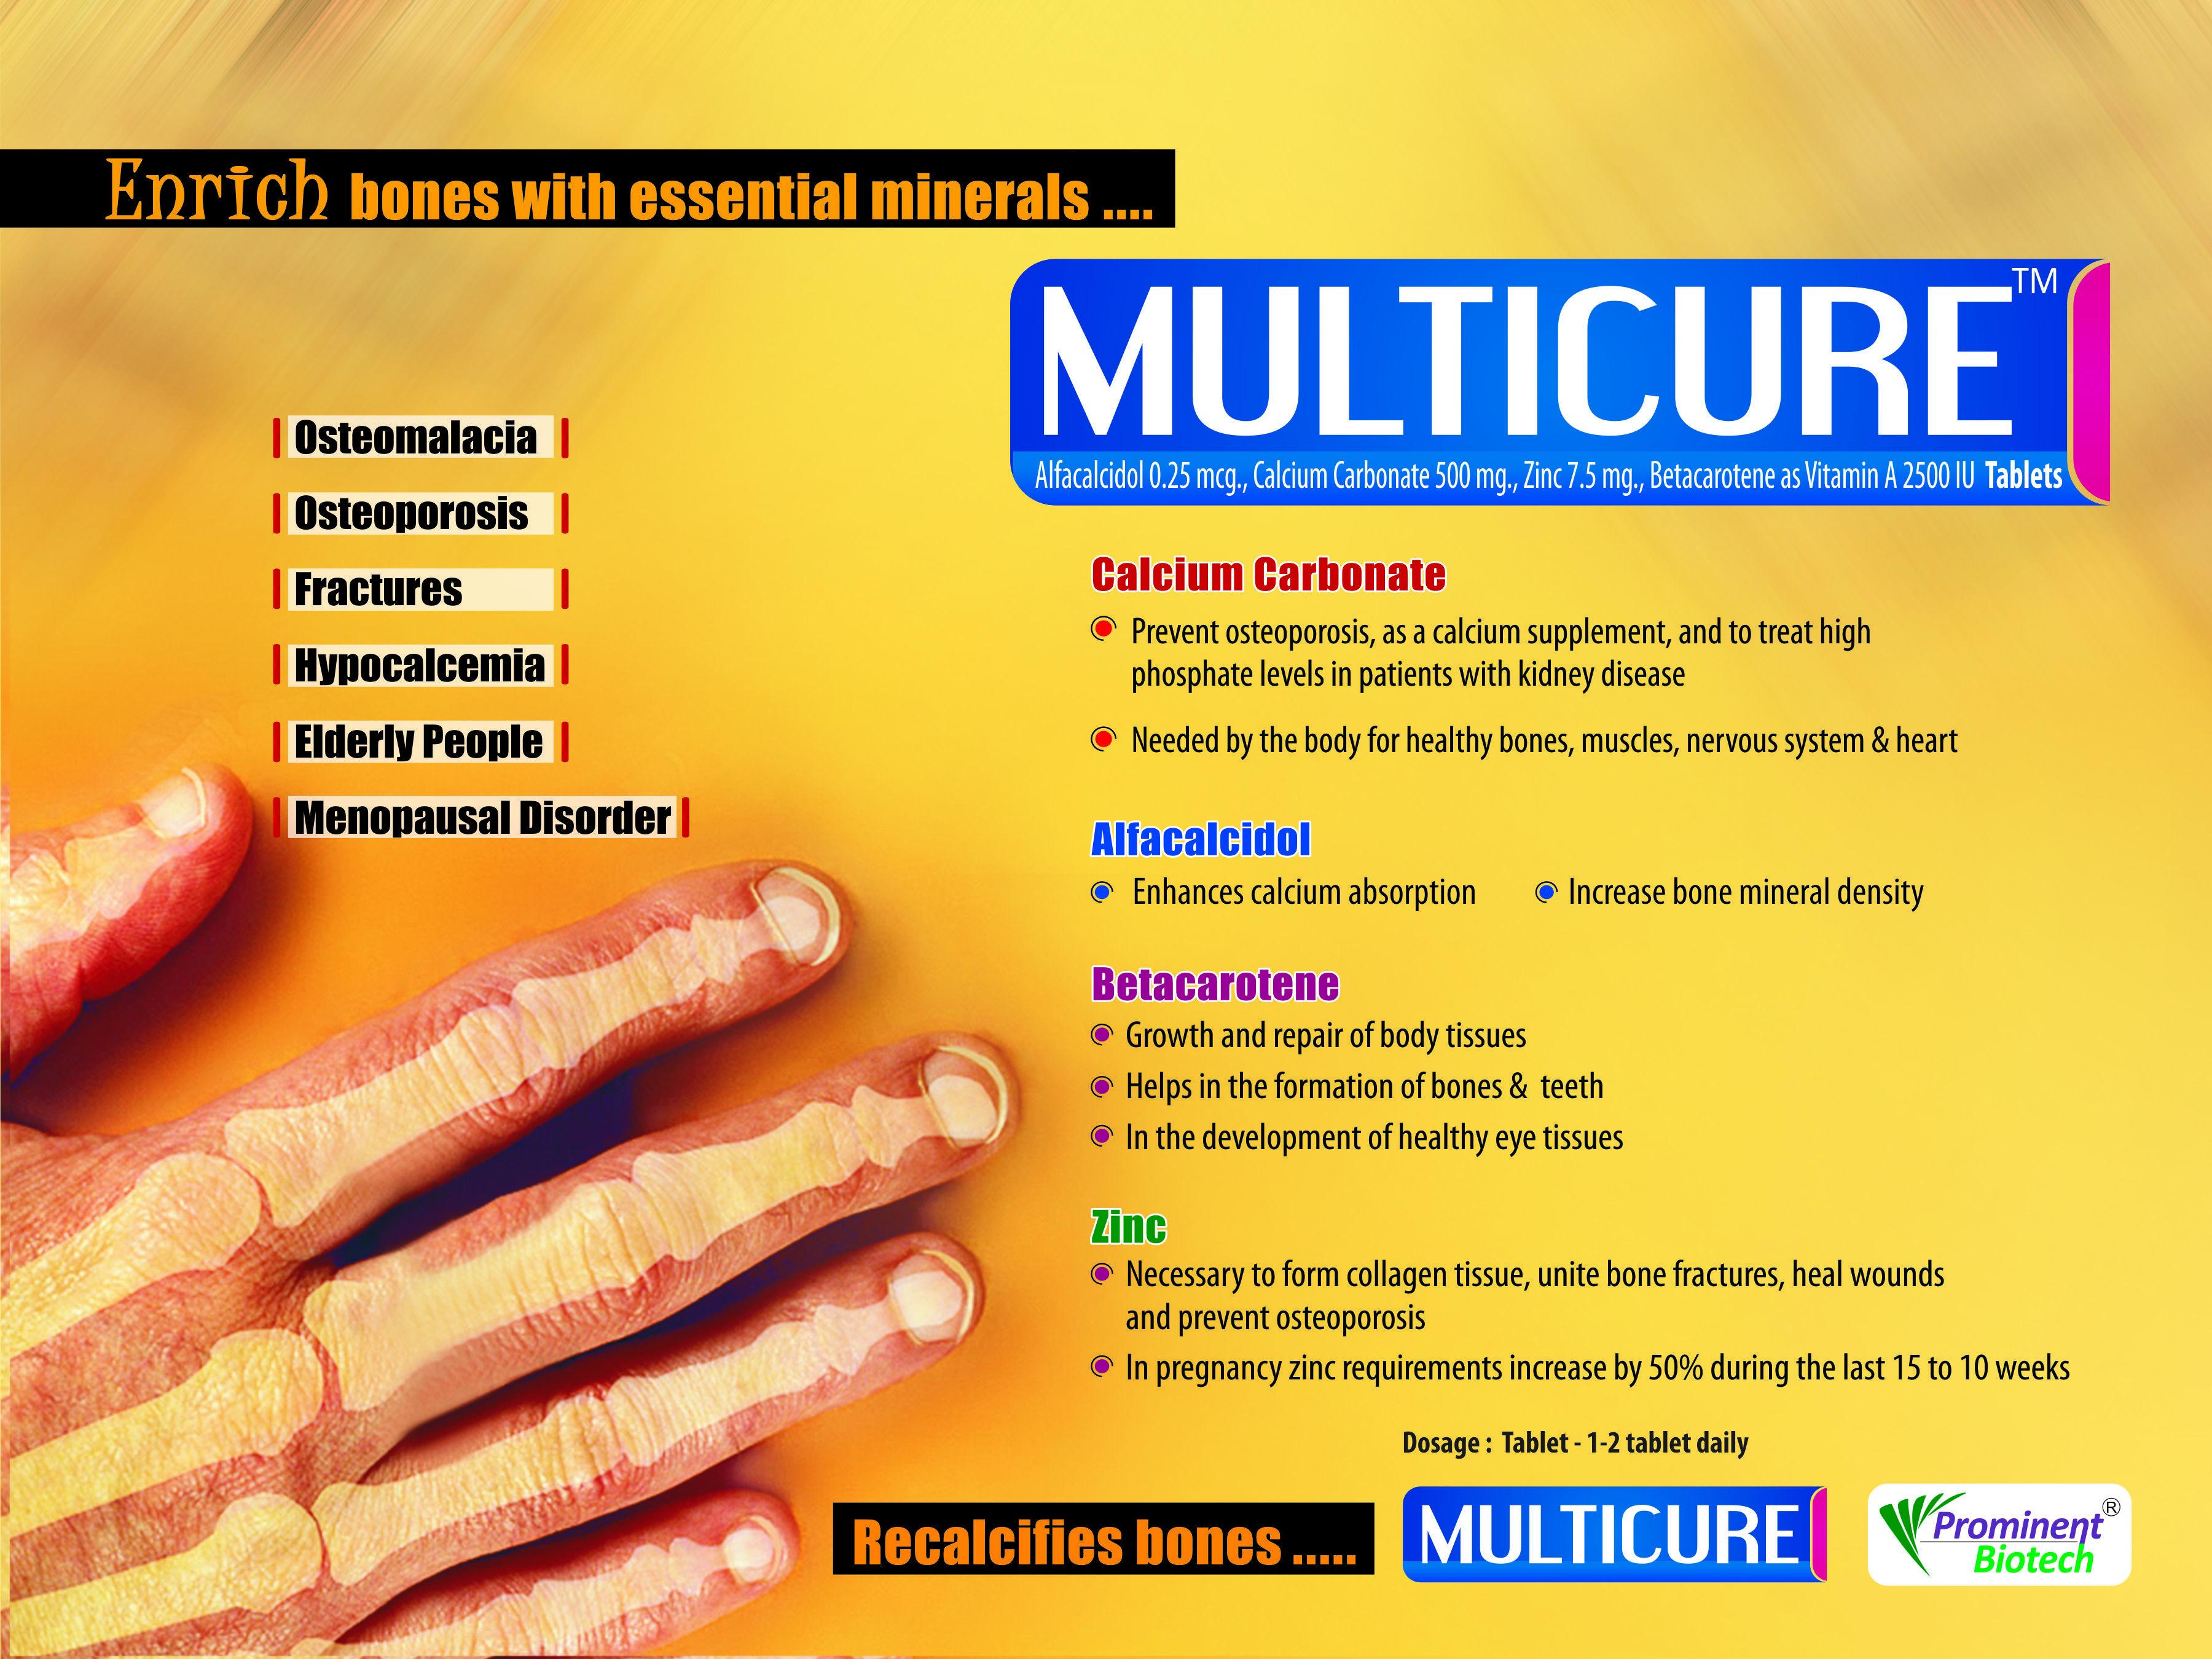 Cal. Carbonate 500 mg, Alfacalcidol 0.25 mcg, Zinc 7.5 mg & Vit. A 2500 IU,